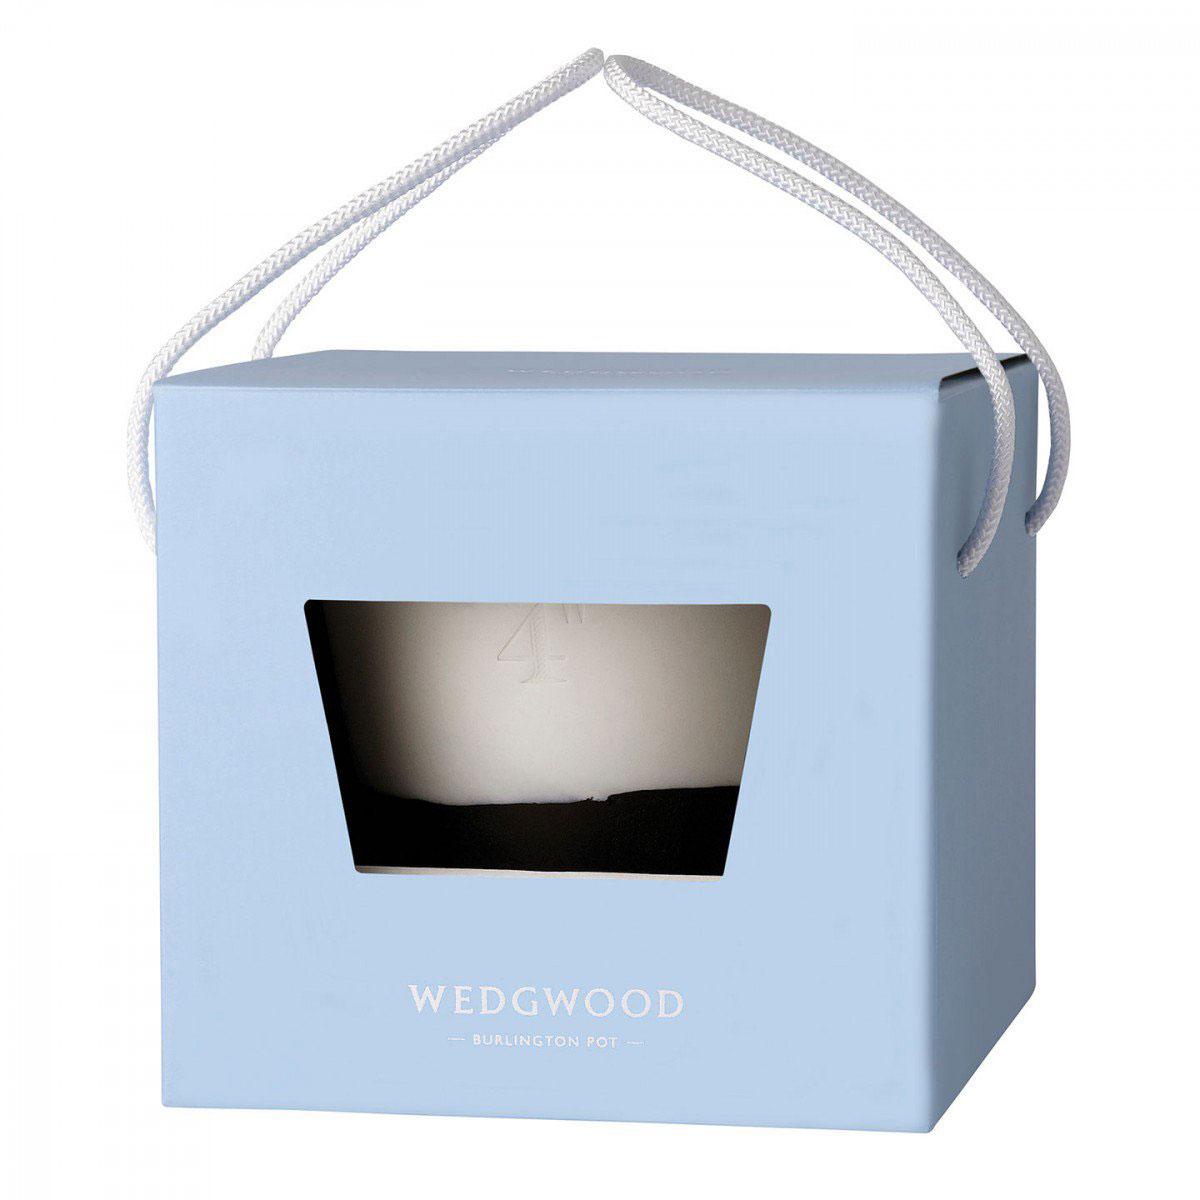 "Wedgwood Jasperware Burlington Pot 4"", Black and White"